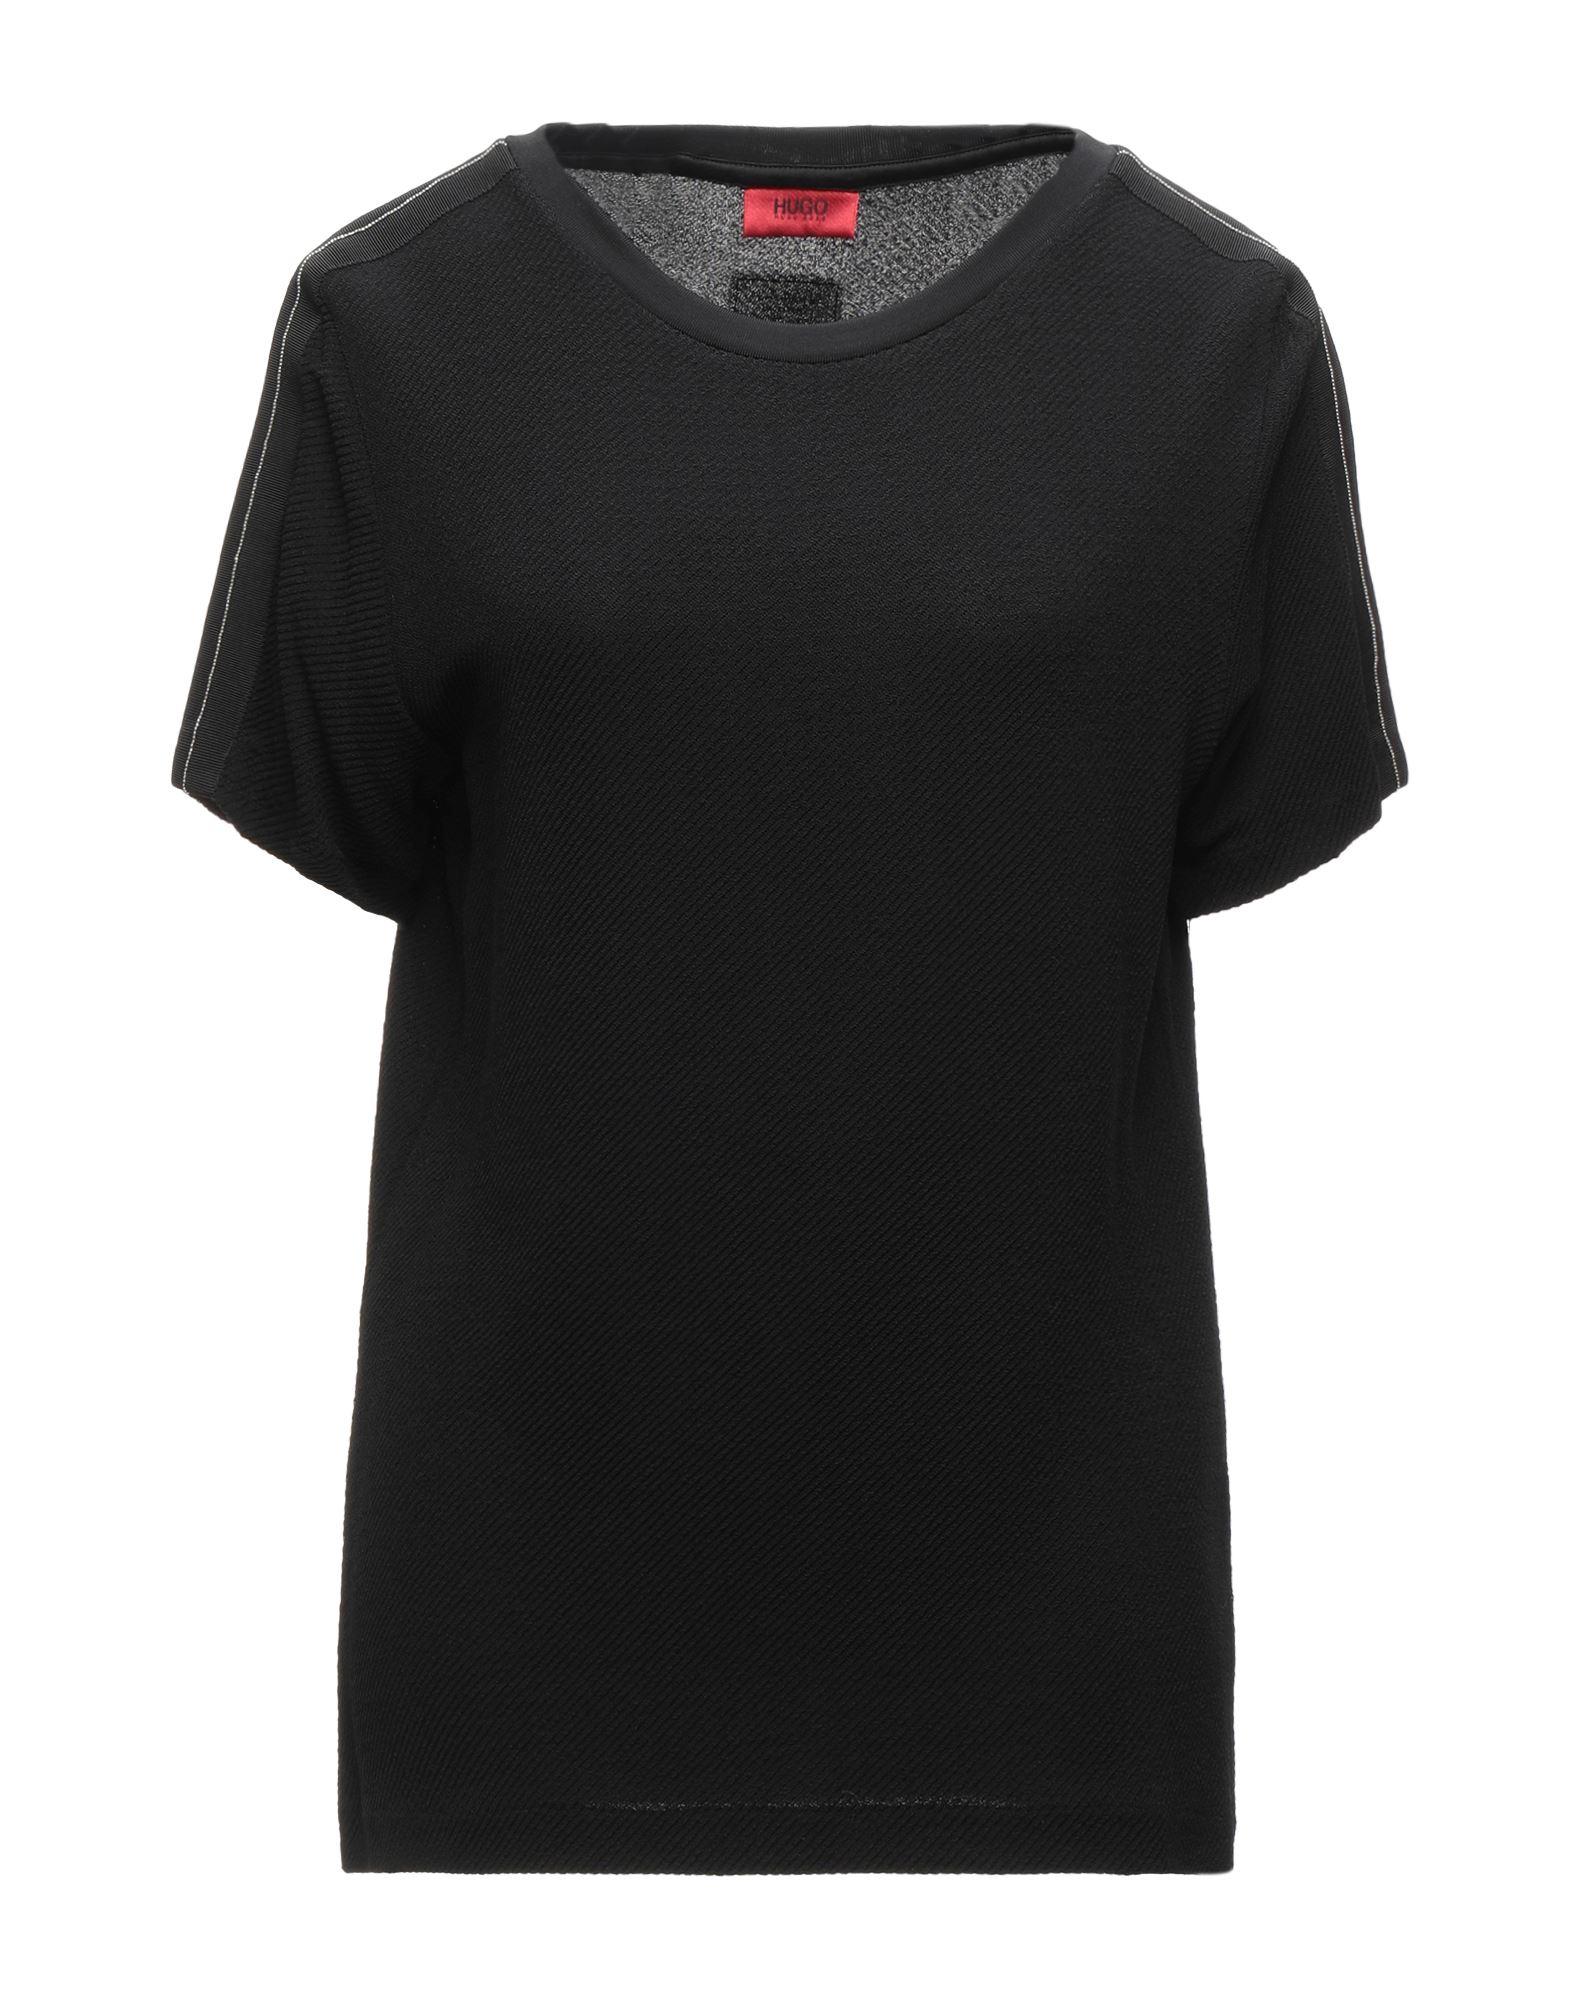 HUGO HUGO BOSS Sweaters - Item 14109263